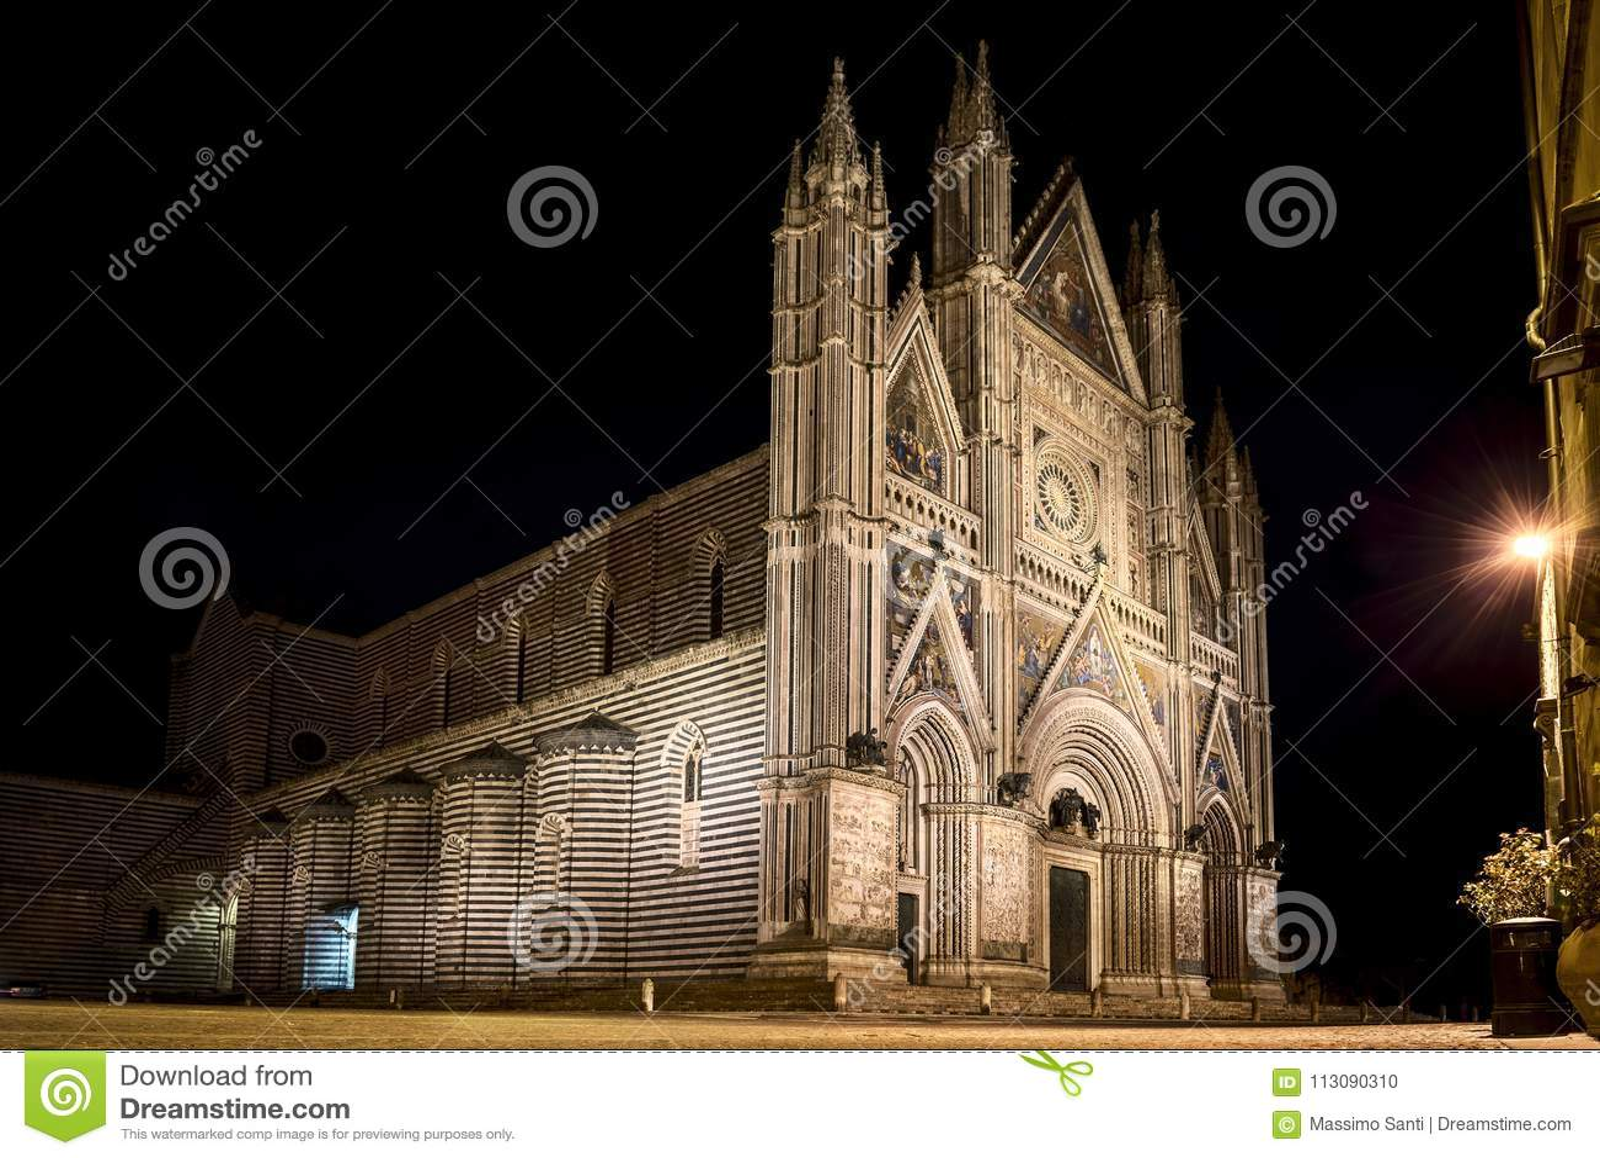 Panoramic view of Cathedral of Orvieto Duomo di Orvieto, by night. Umbria, Italy